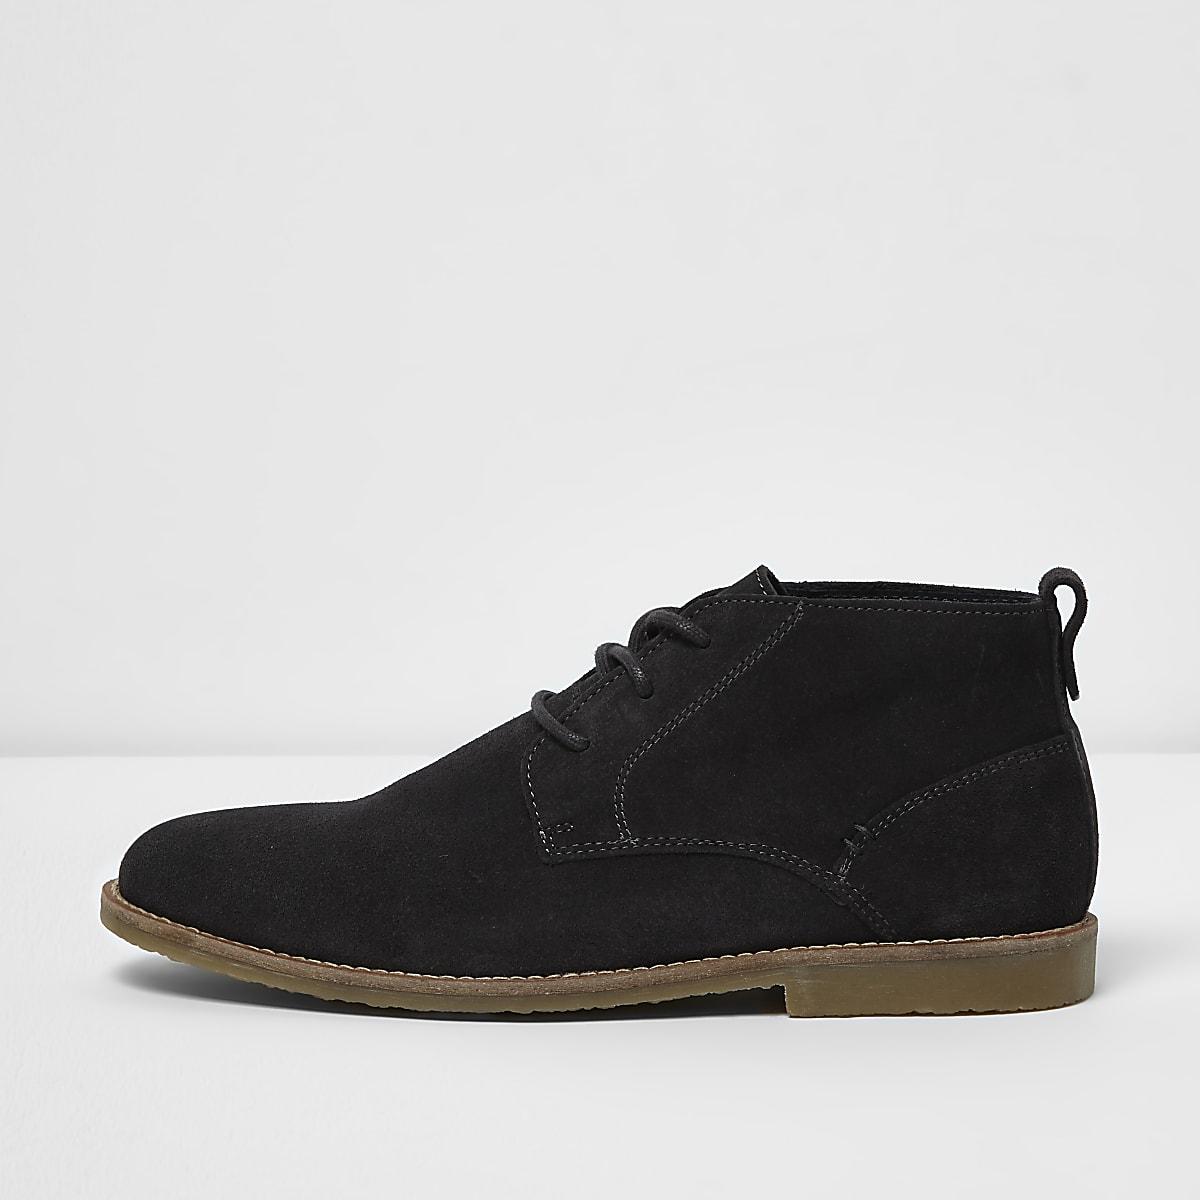 02291311699 Dark grey wide fit suede desert boots - Boots - Shoes   Boots - men